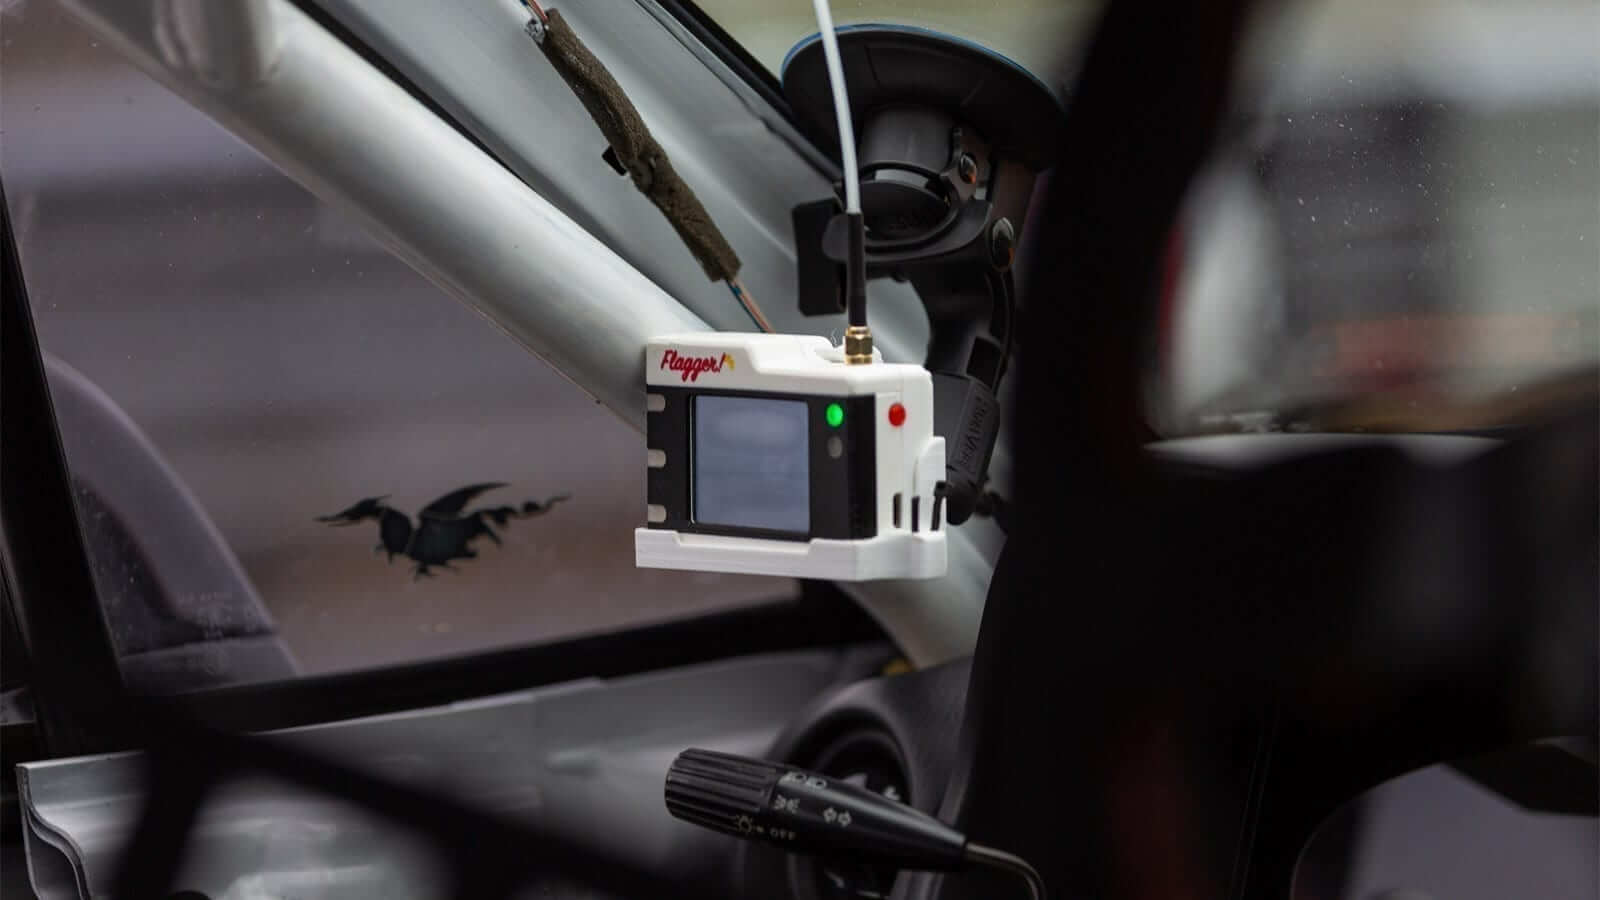 flagger web1 - Flagger In-Car Alert System